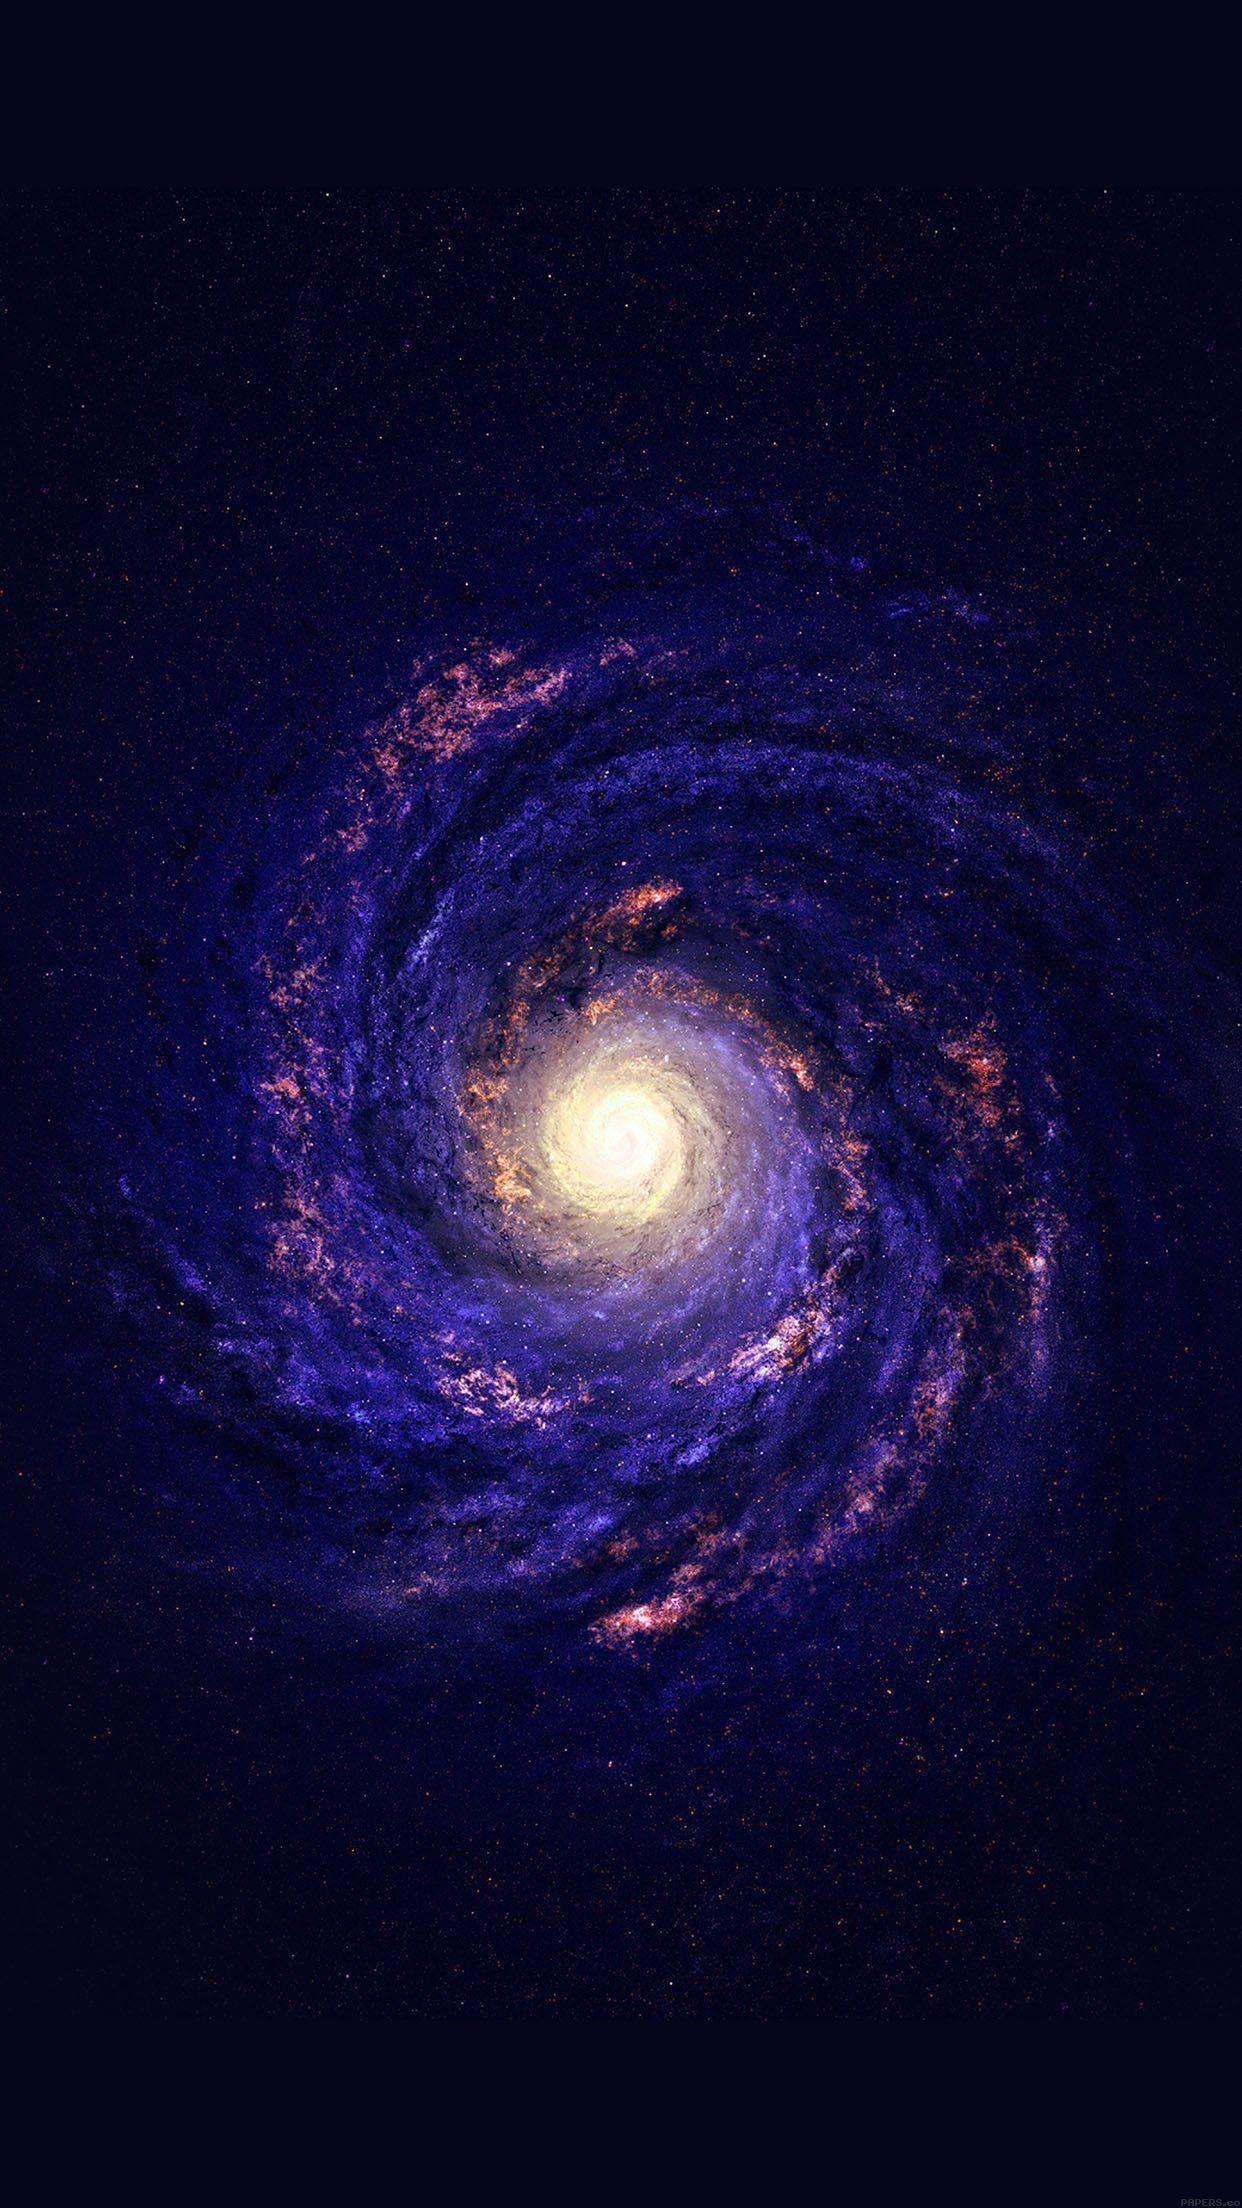 Image Of Anime Wallpaper Galaxy S8 Nasa Space Night Skies In